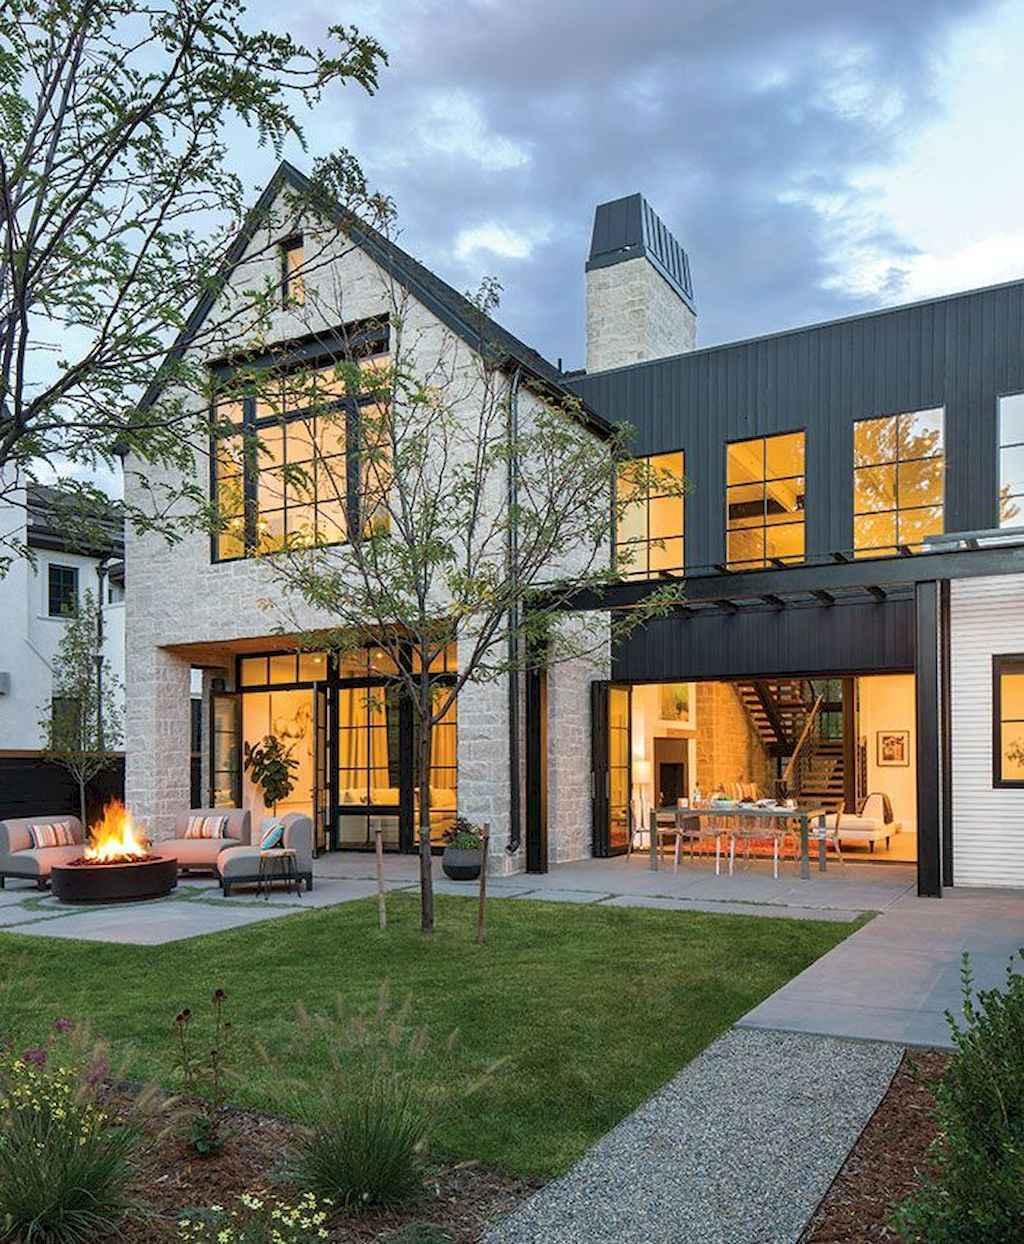 90 incredible modern farmhouse exterior design ideas 63 for Farmhouse style architecture